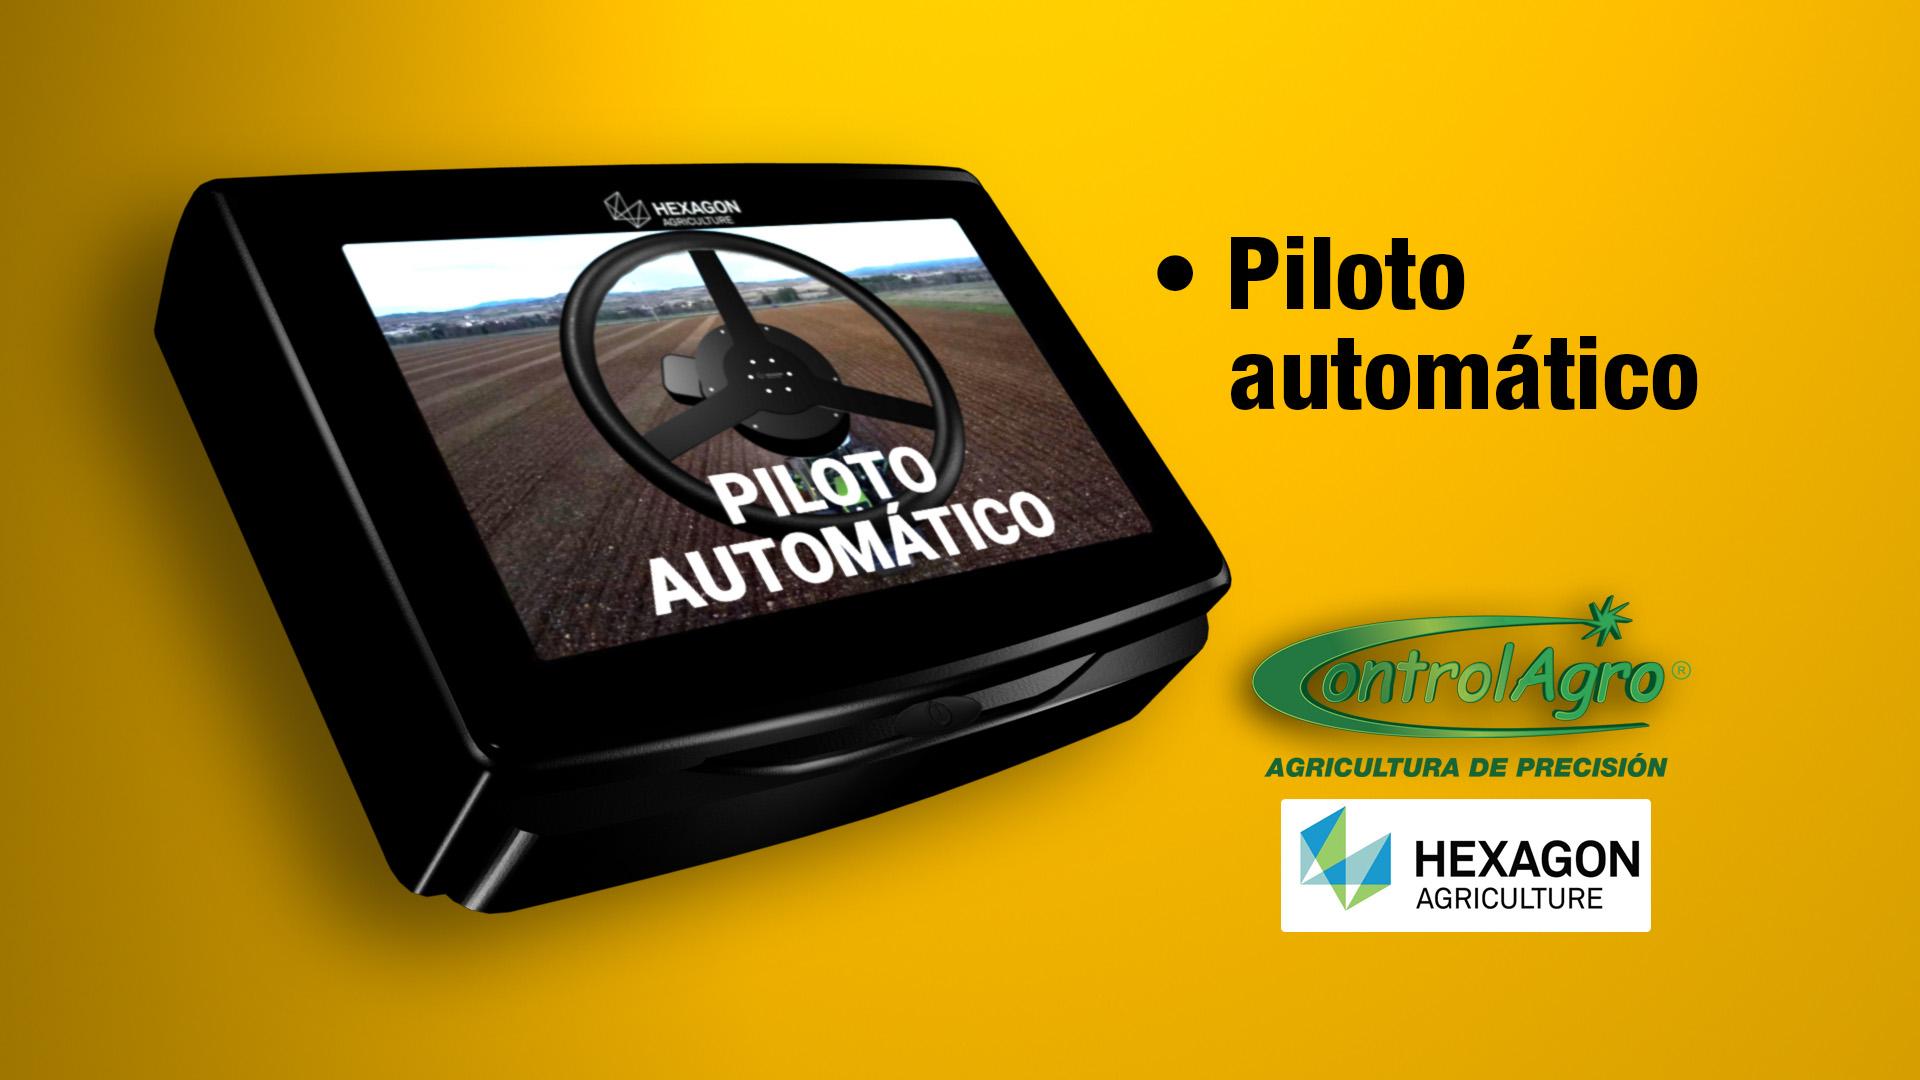 Piloto Automático